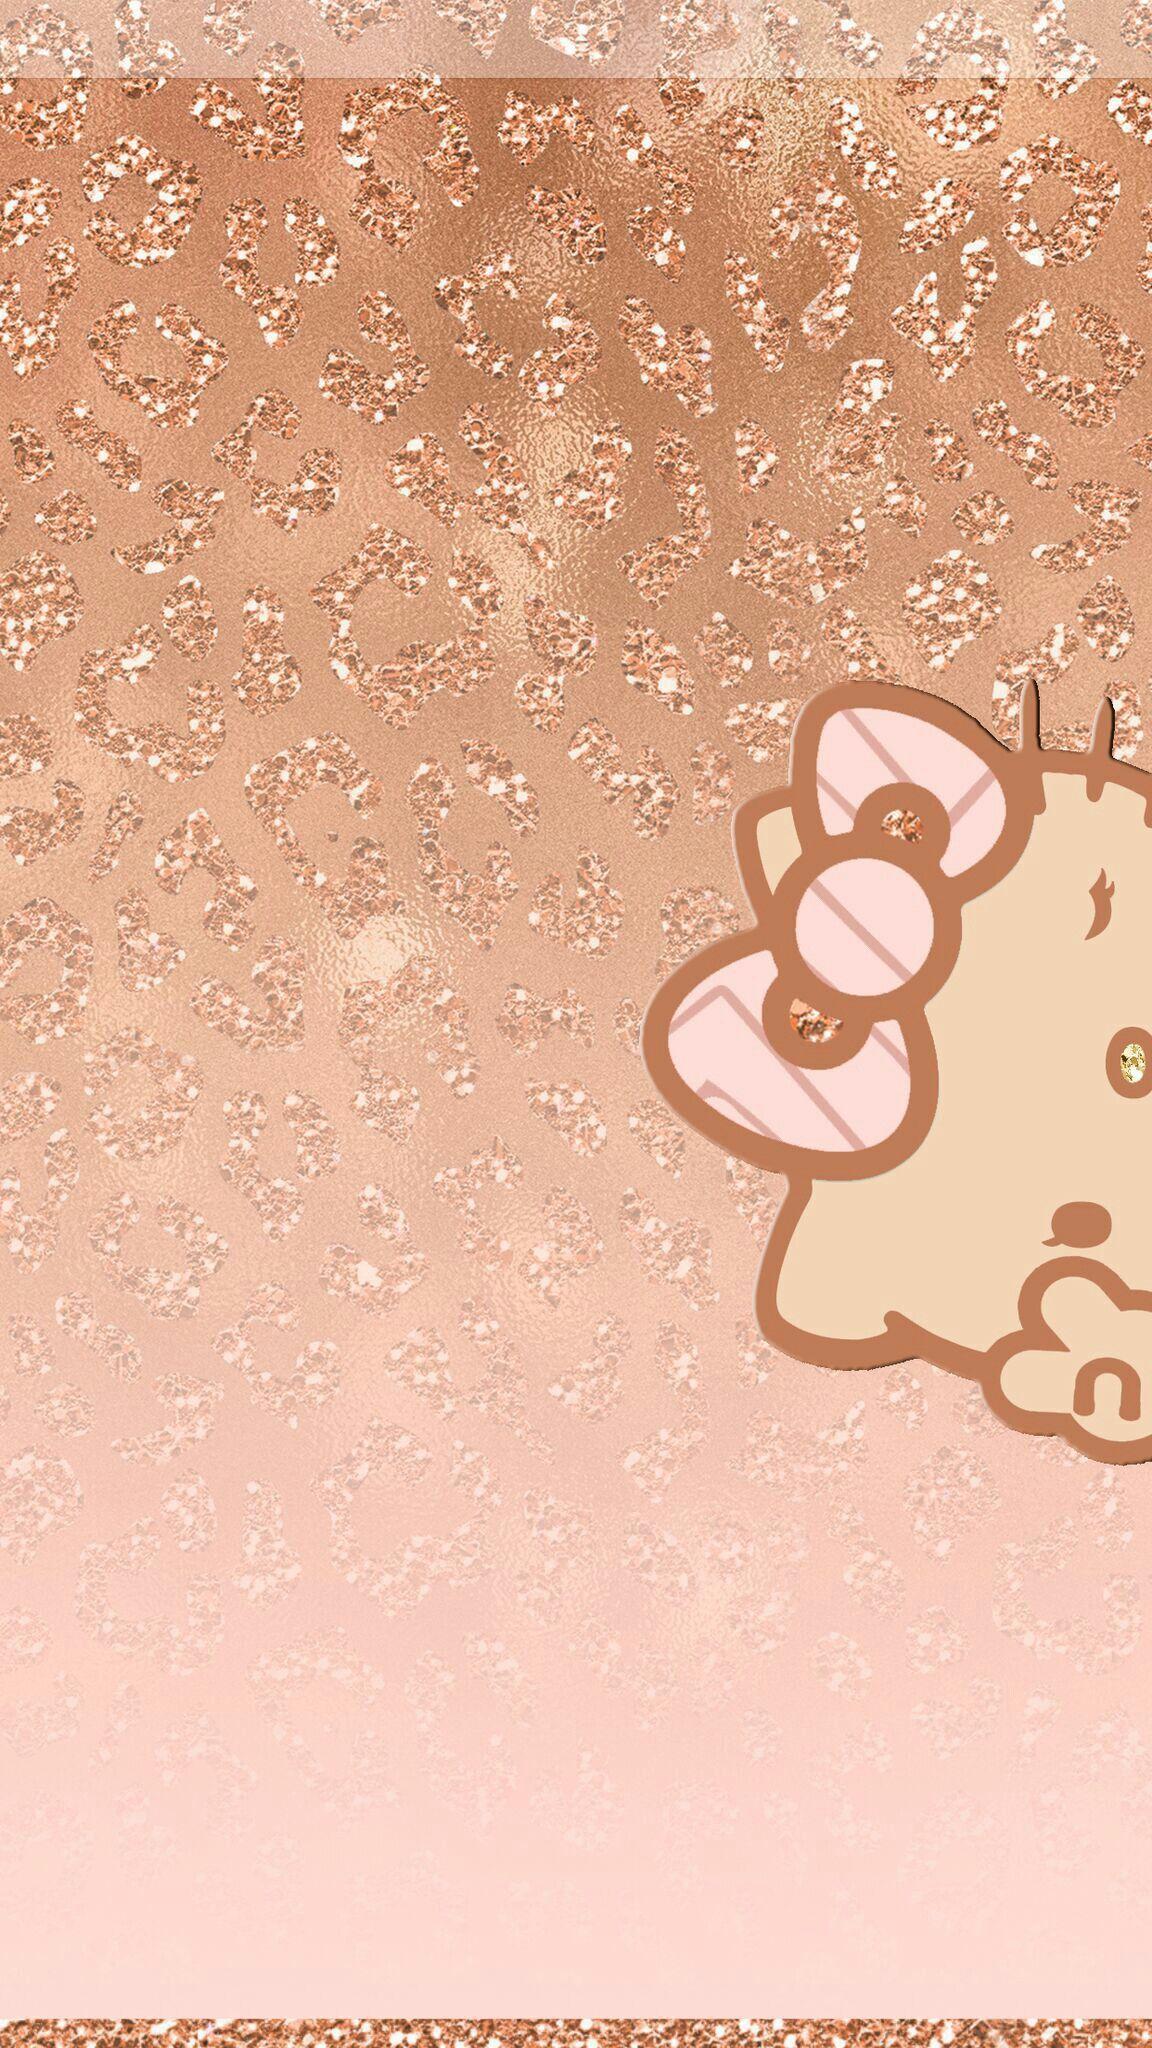 Most Inspiring Wallpaper Hello Kitty Ipod Touch - 8ffb3c7fc3cb46c4464622f17fb2bfc6  Photograph_854158.jpg